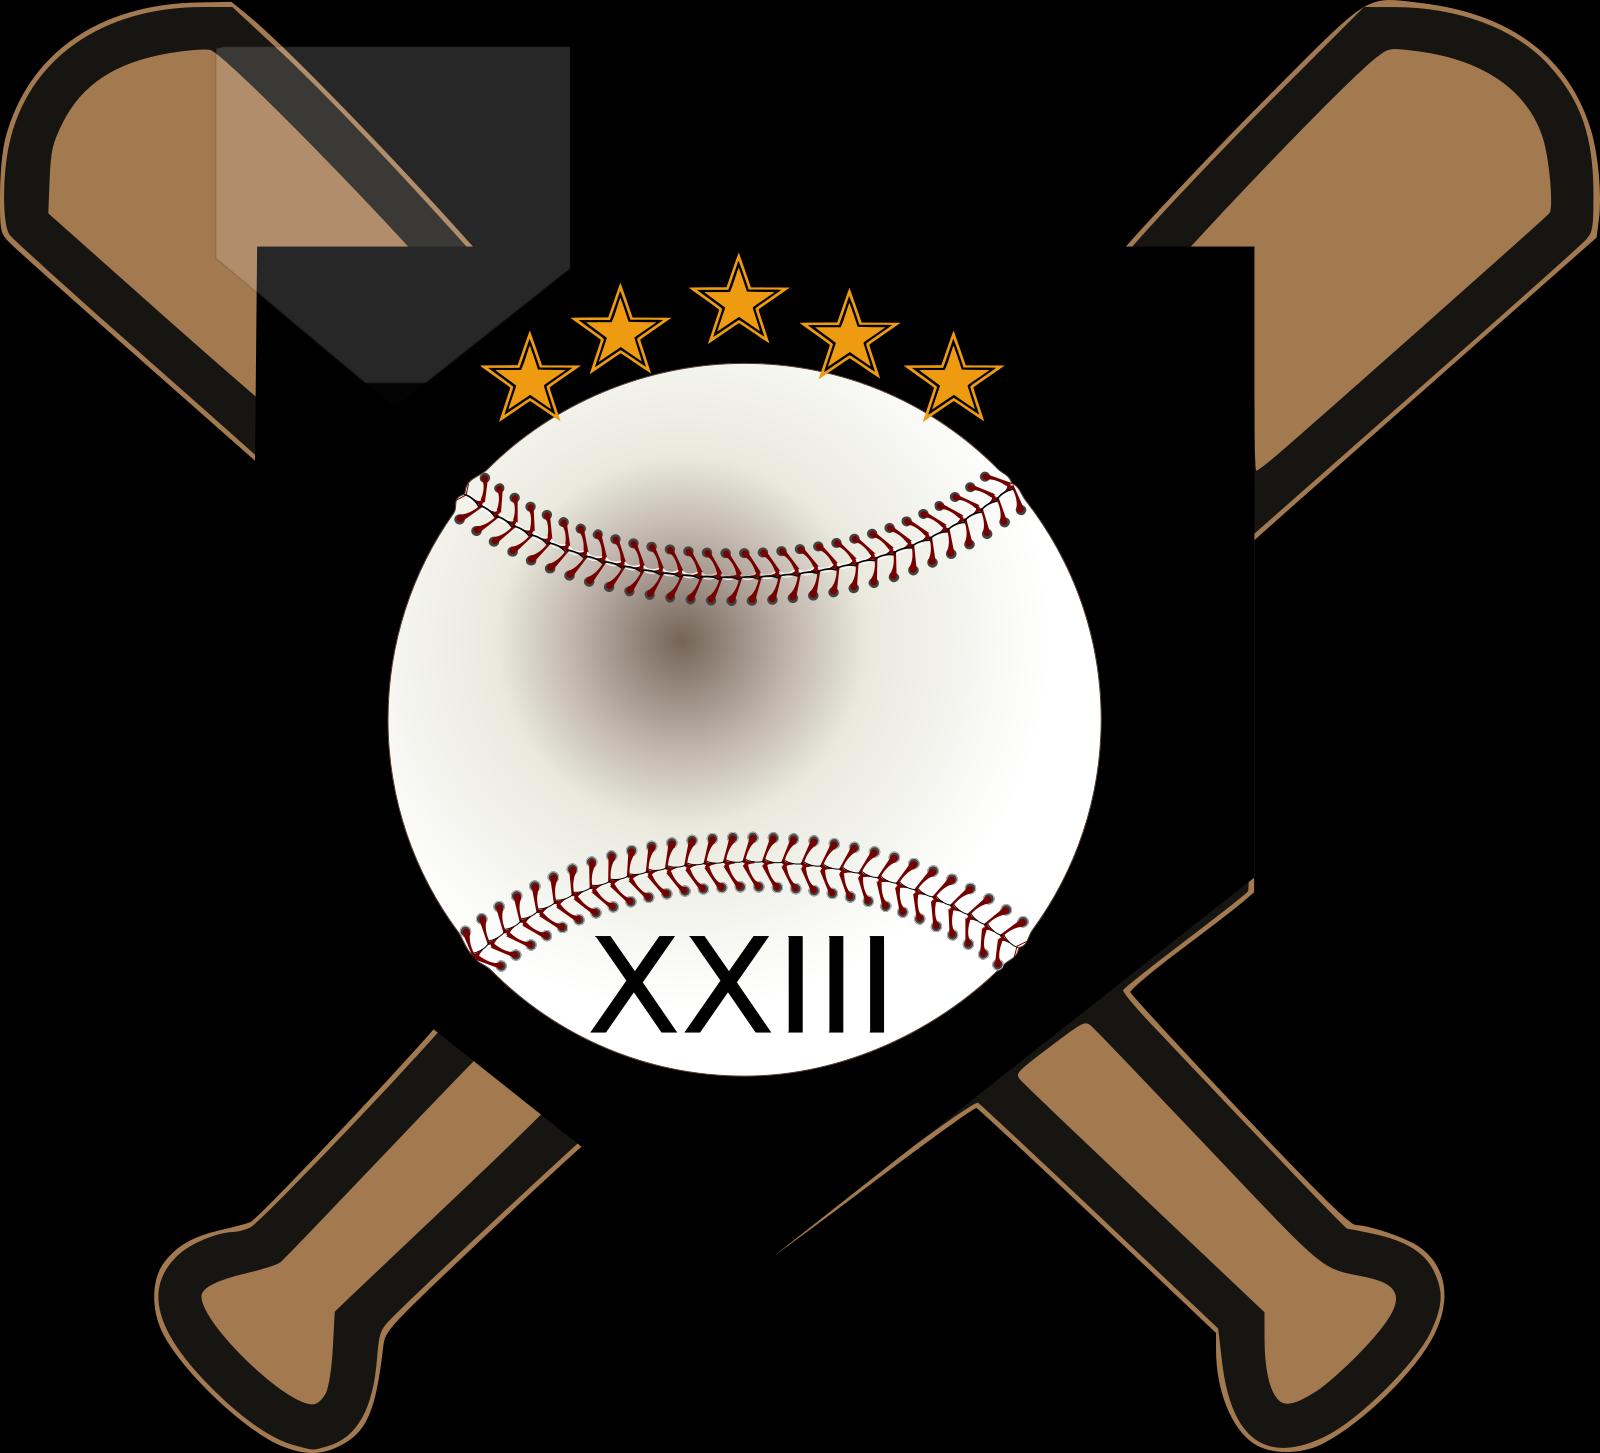 Download Home Svg Clip Arts - Baseball Bat - Png Download - Full ...